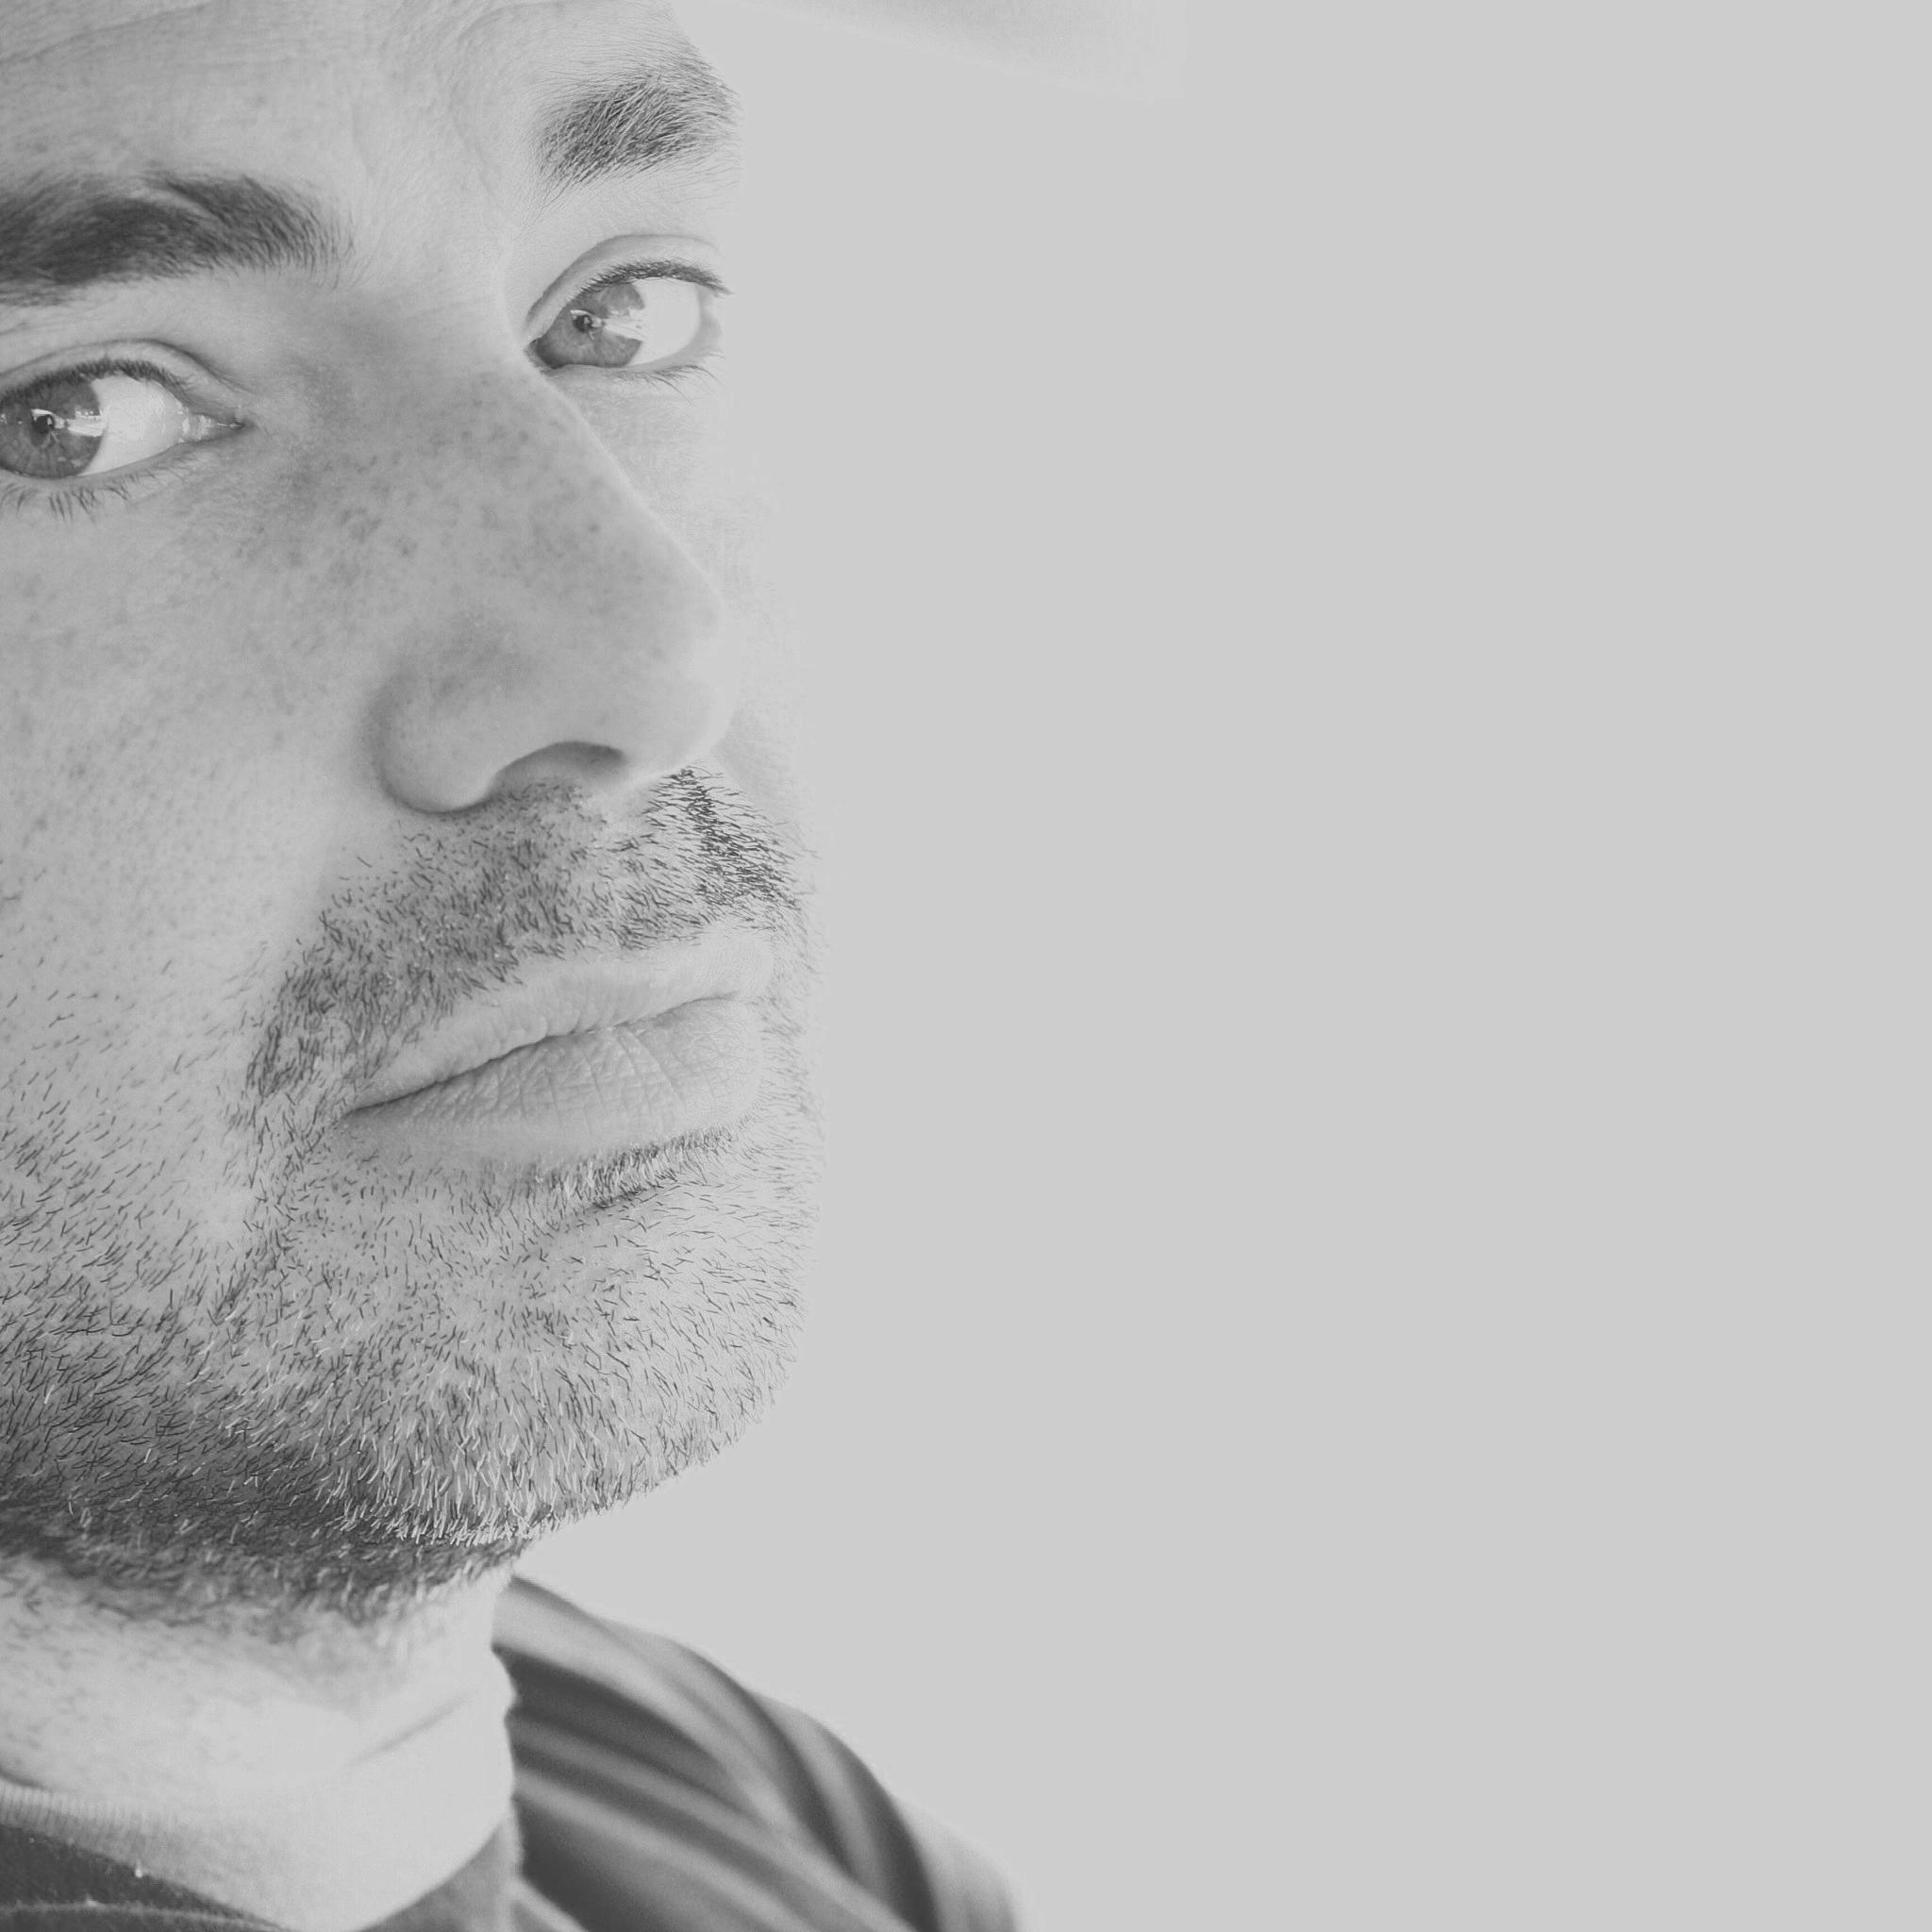 Chad Hunter is the Principal/Creative Director at Weehopper Creative.